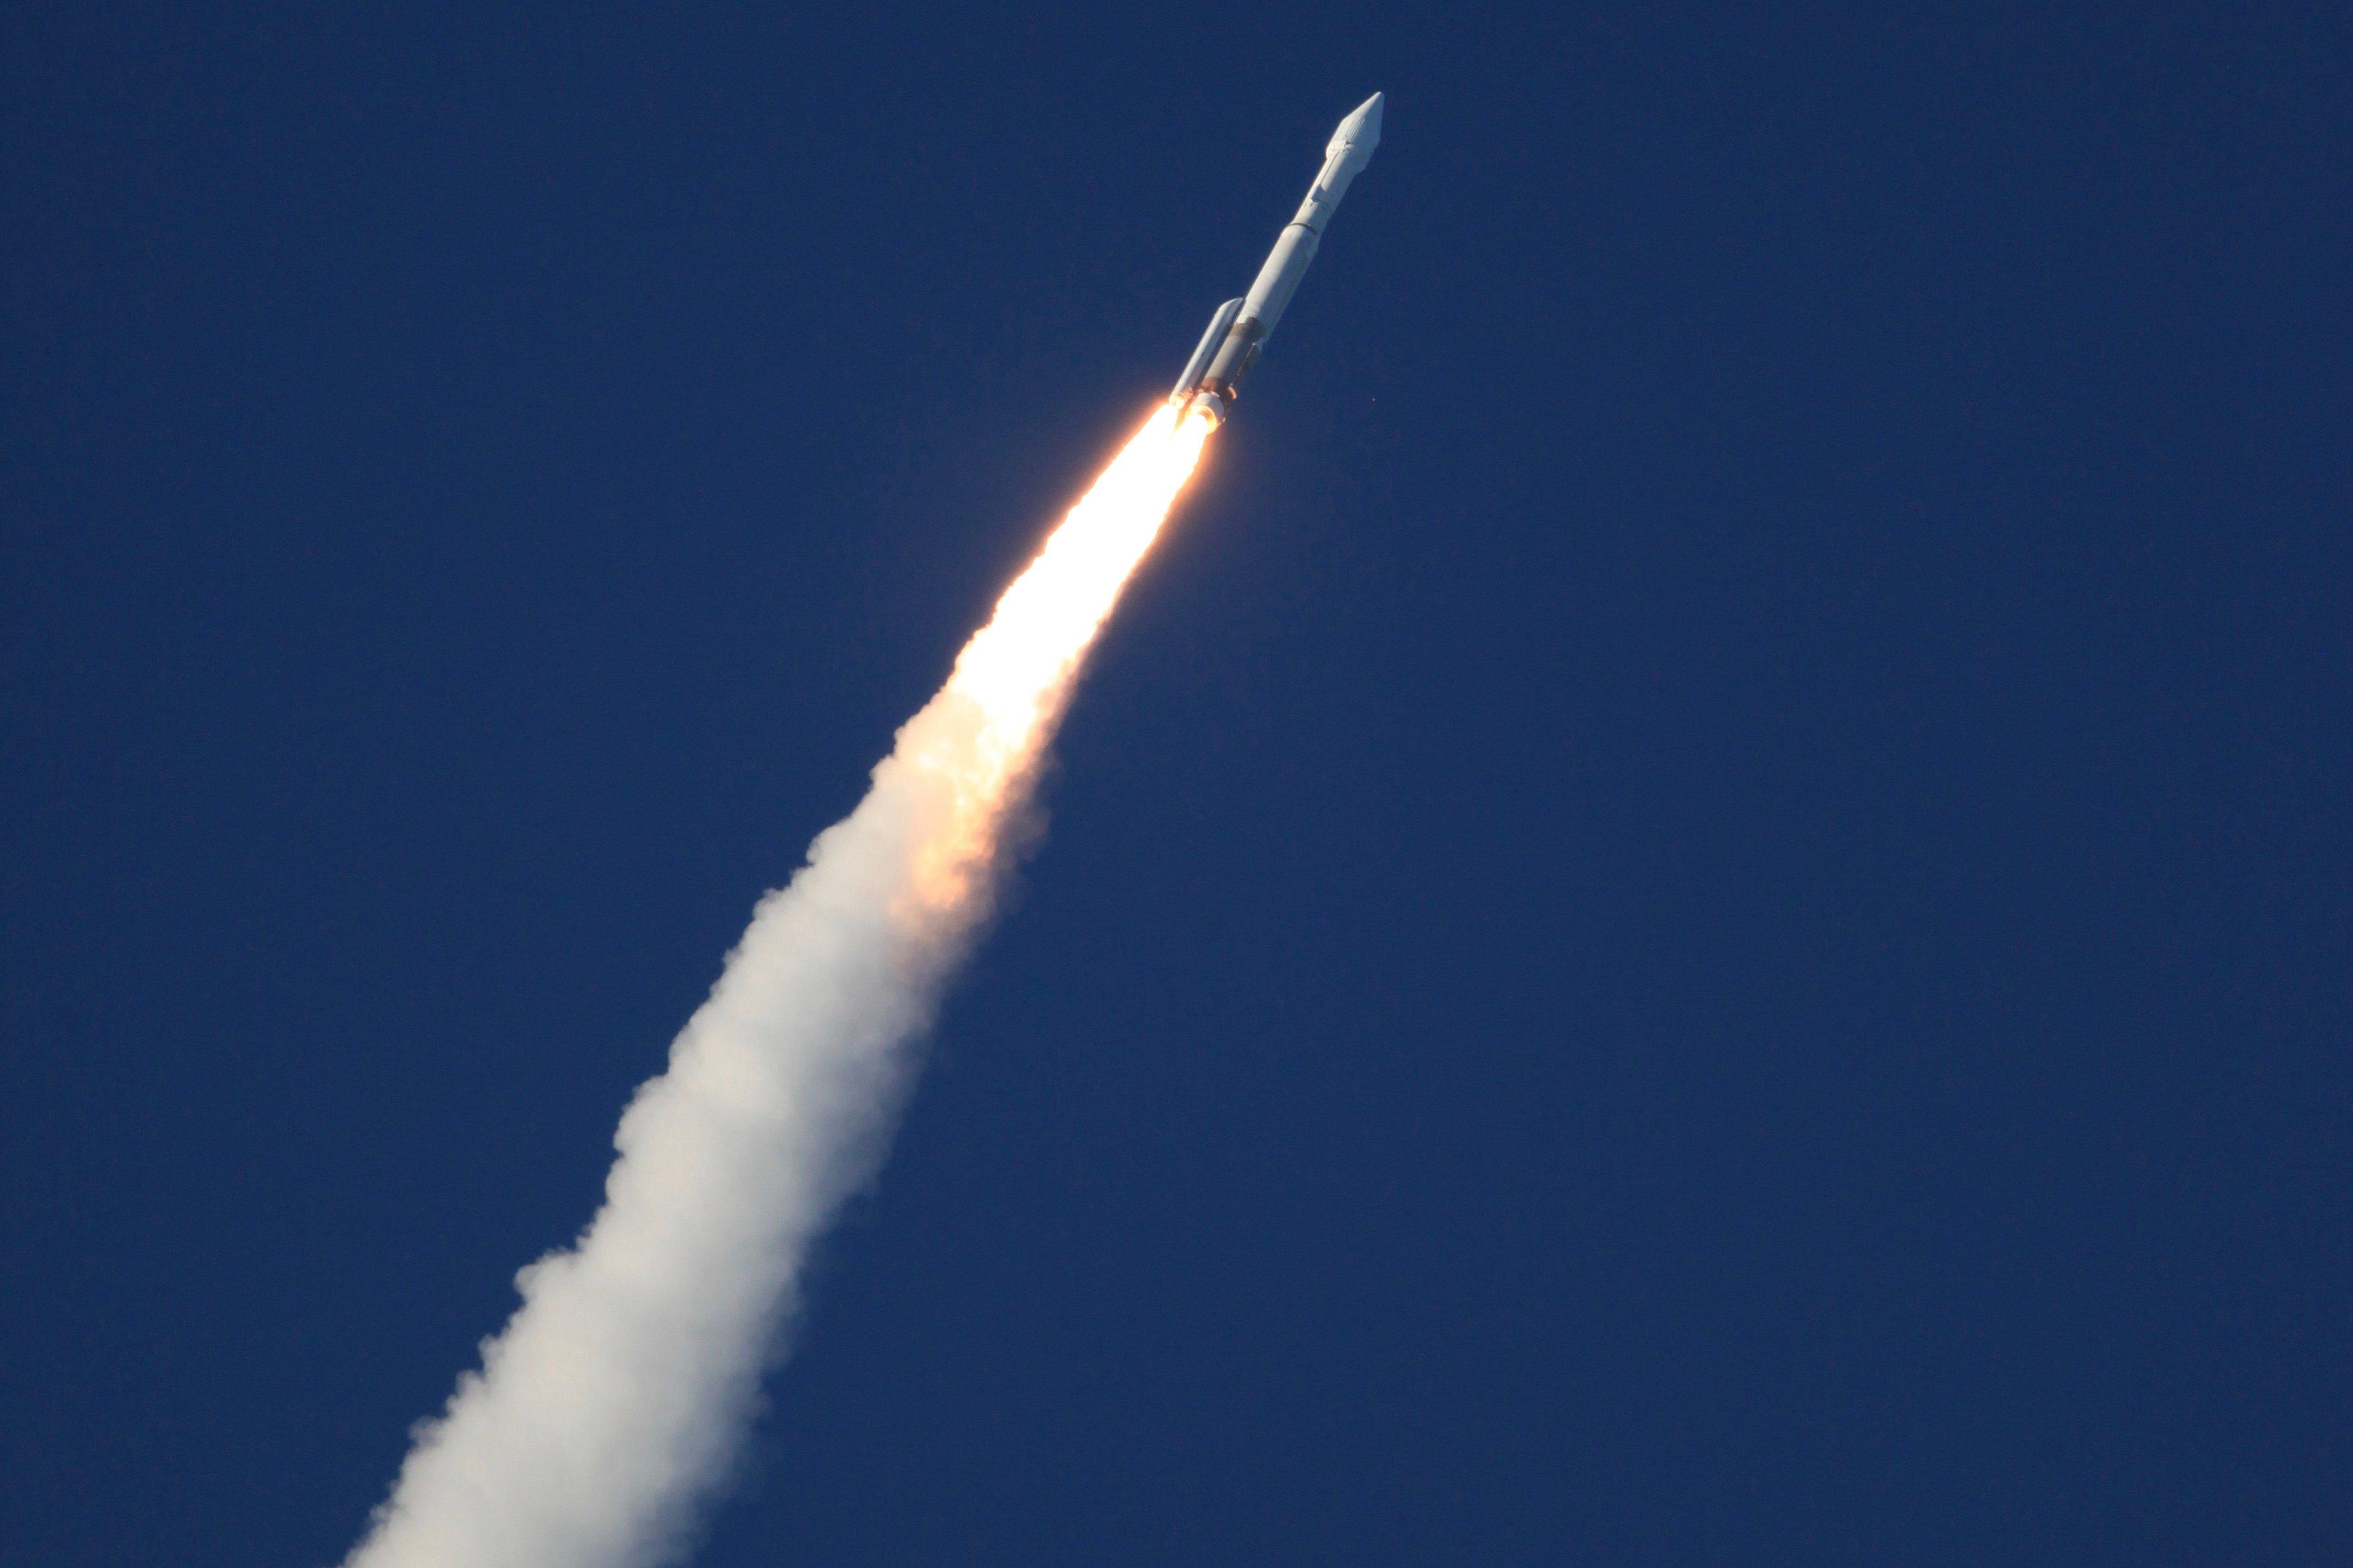 A ULA Atlas V 411 configuration rocket launches.